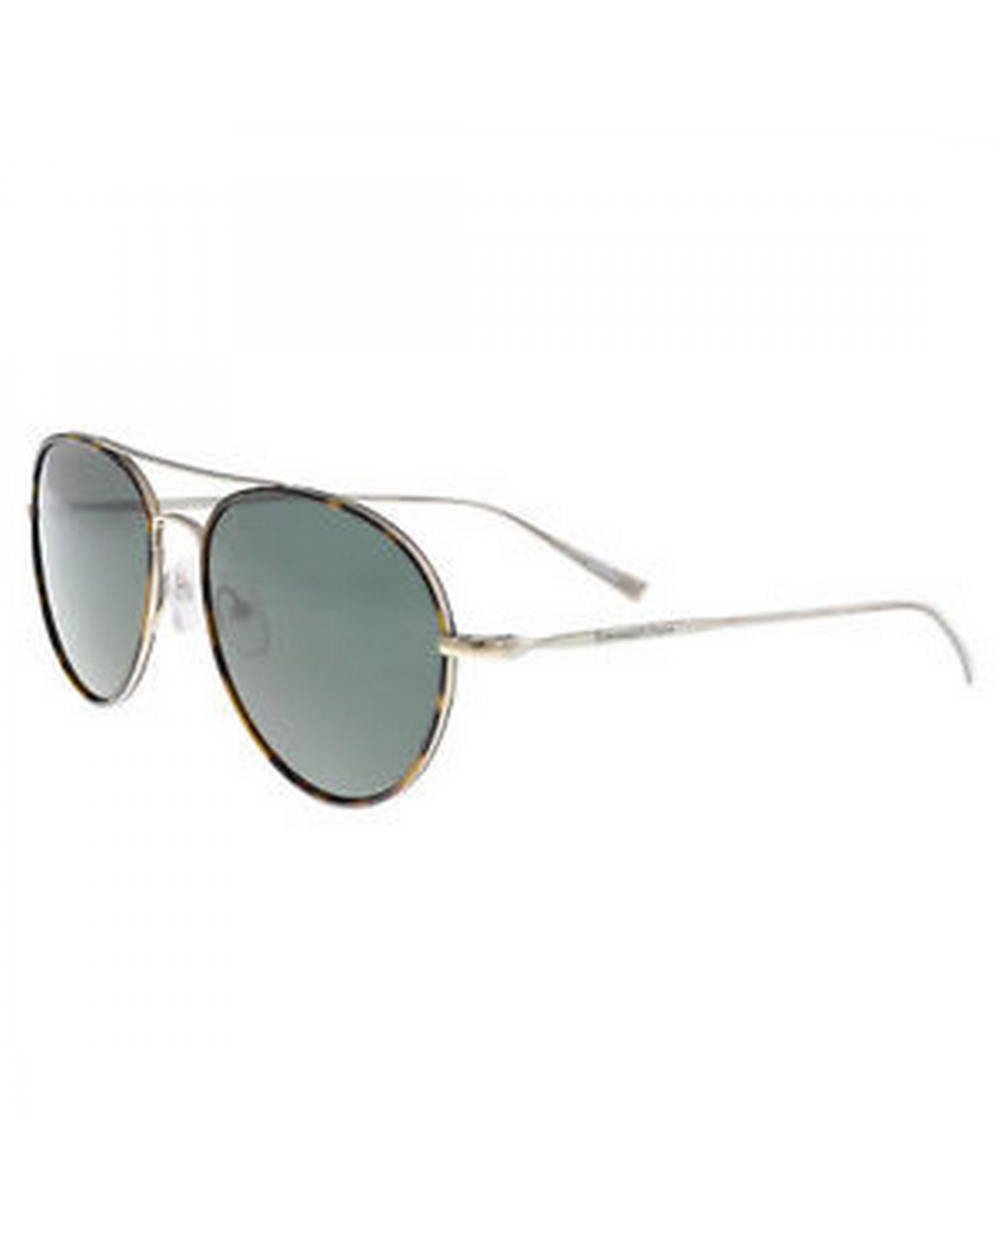 Occhiale da sole Ermenegildo Zegna EZ0053 confezione originale garanzia italia